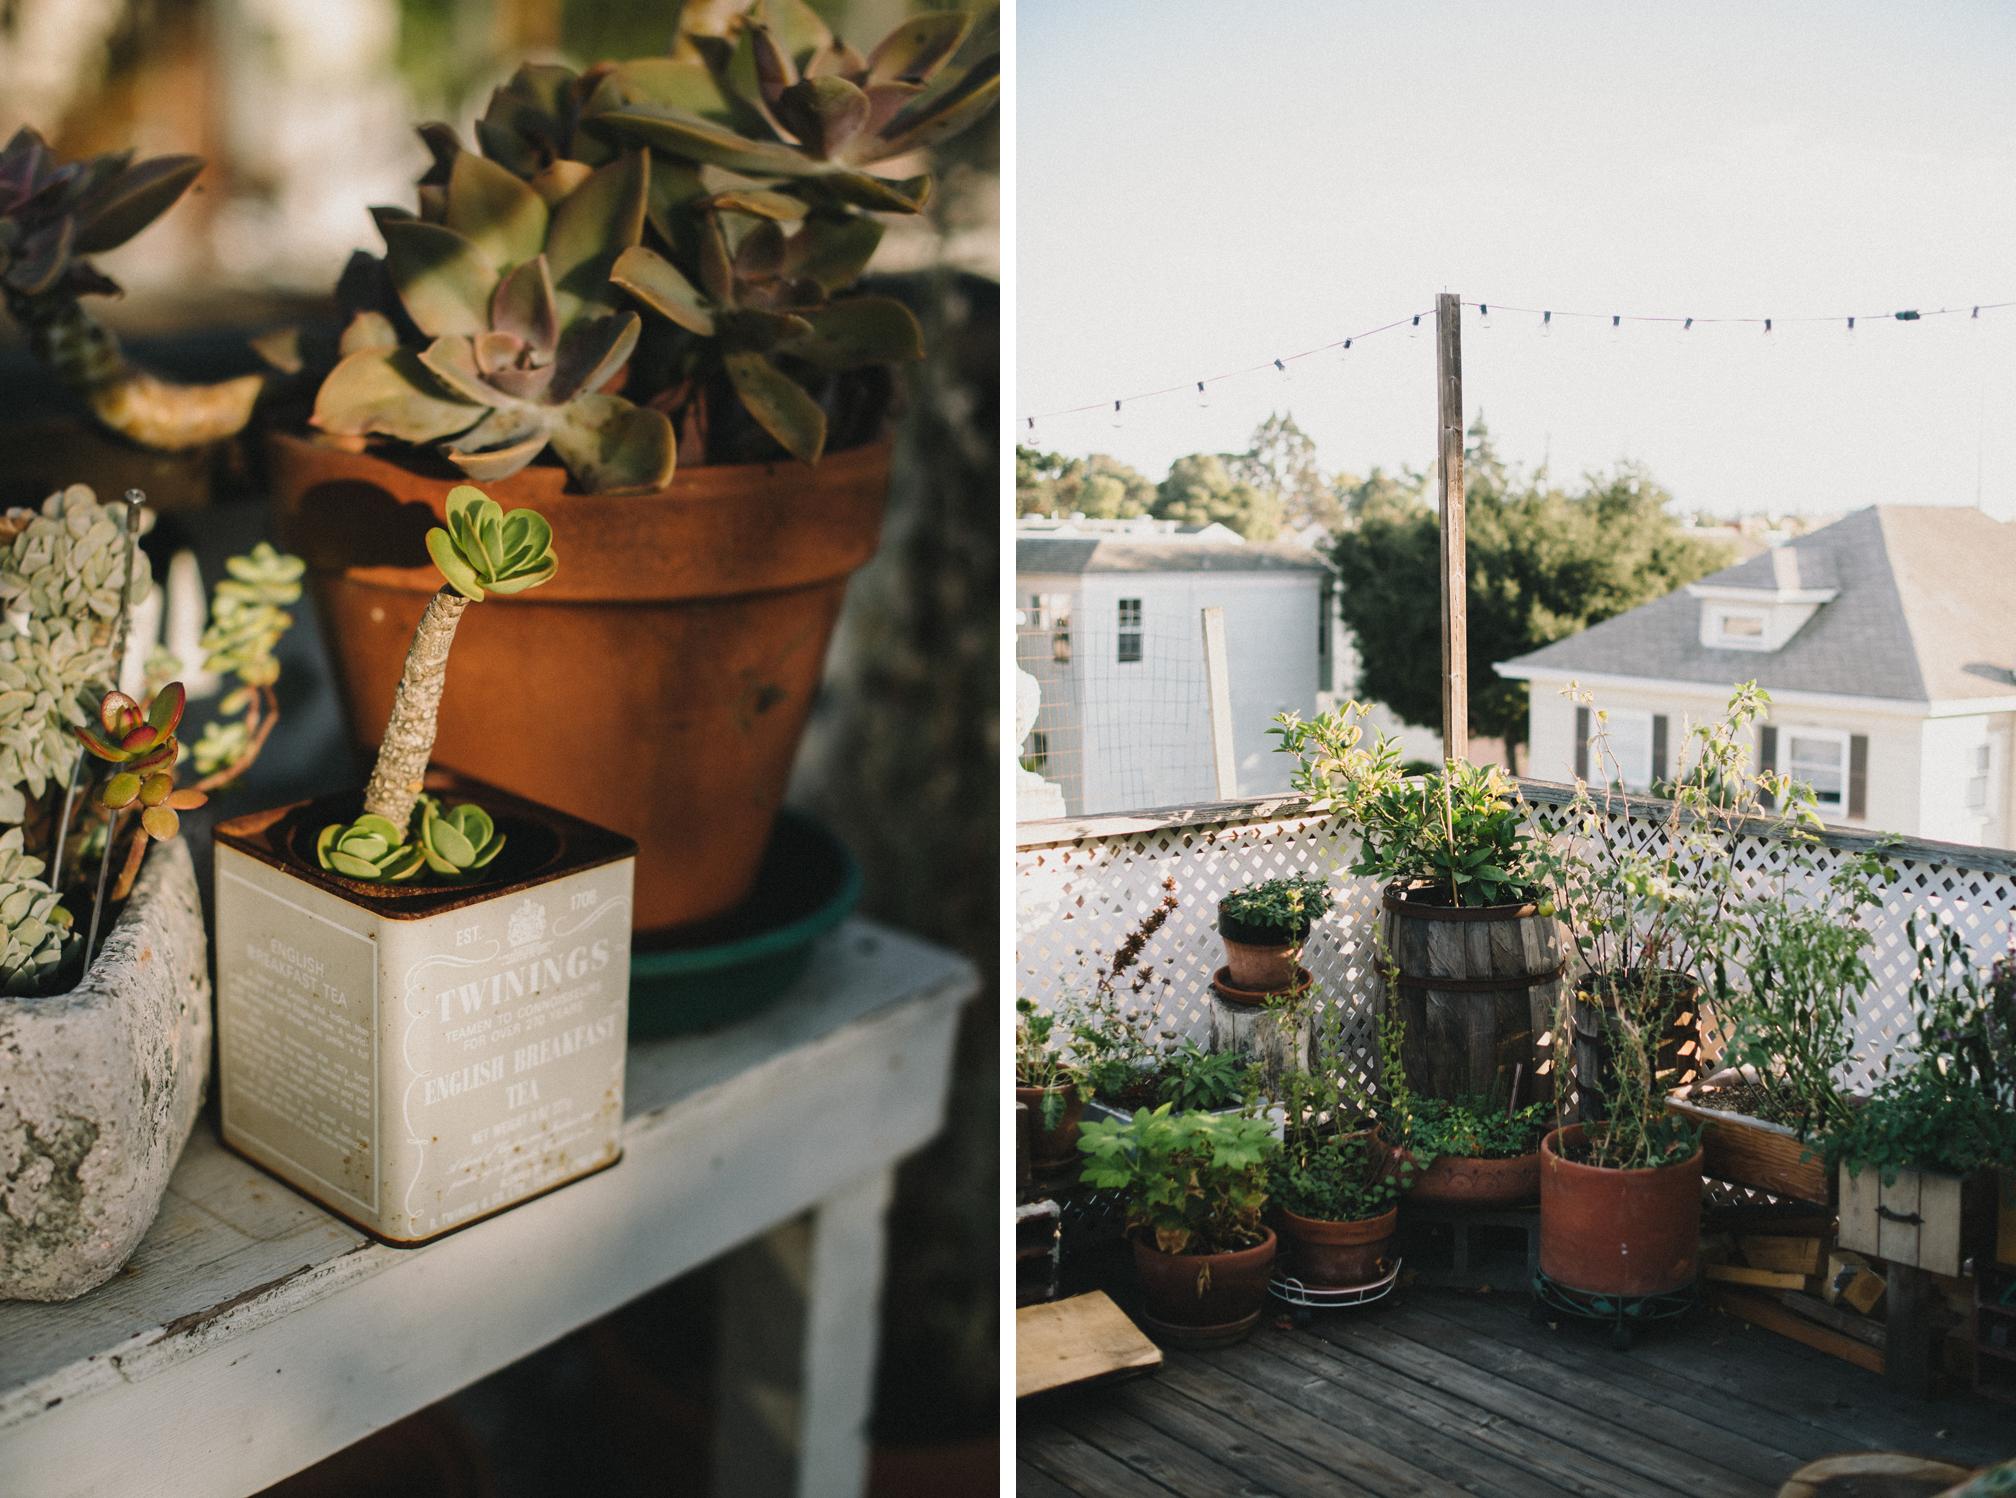 Rooftop Garden  | The Honest Home | Jared Tharp | Loveridge Photography